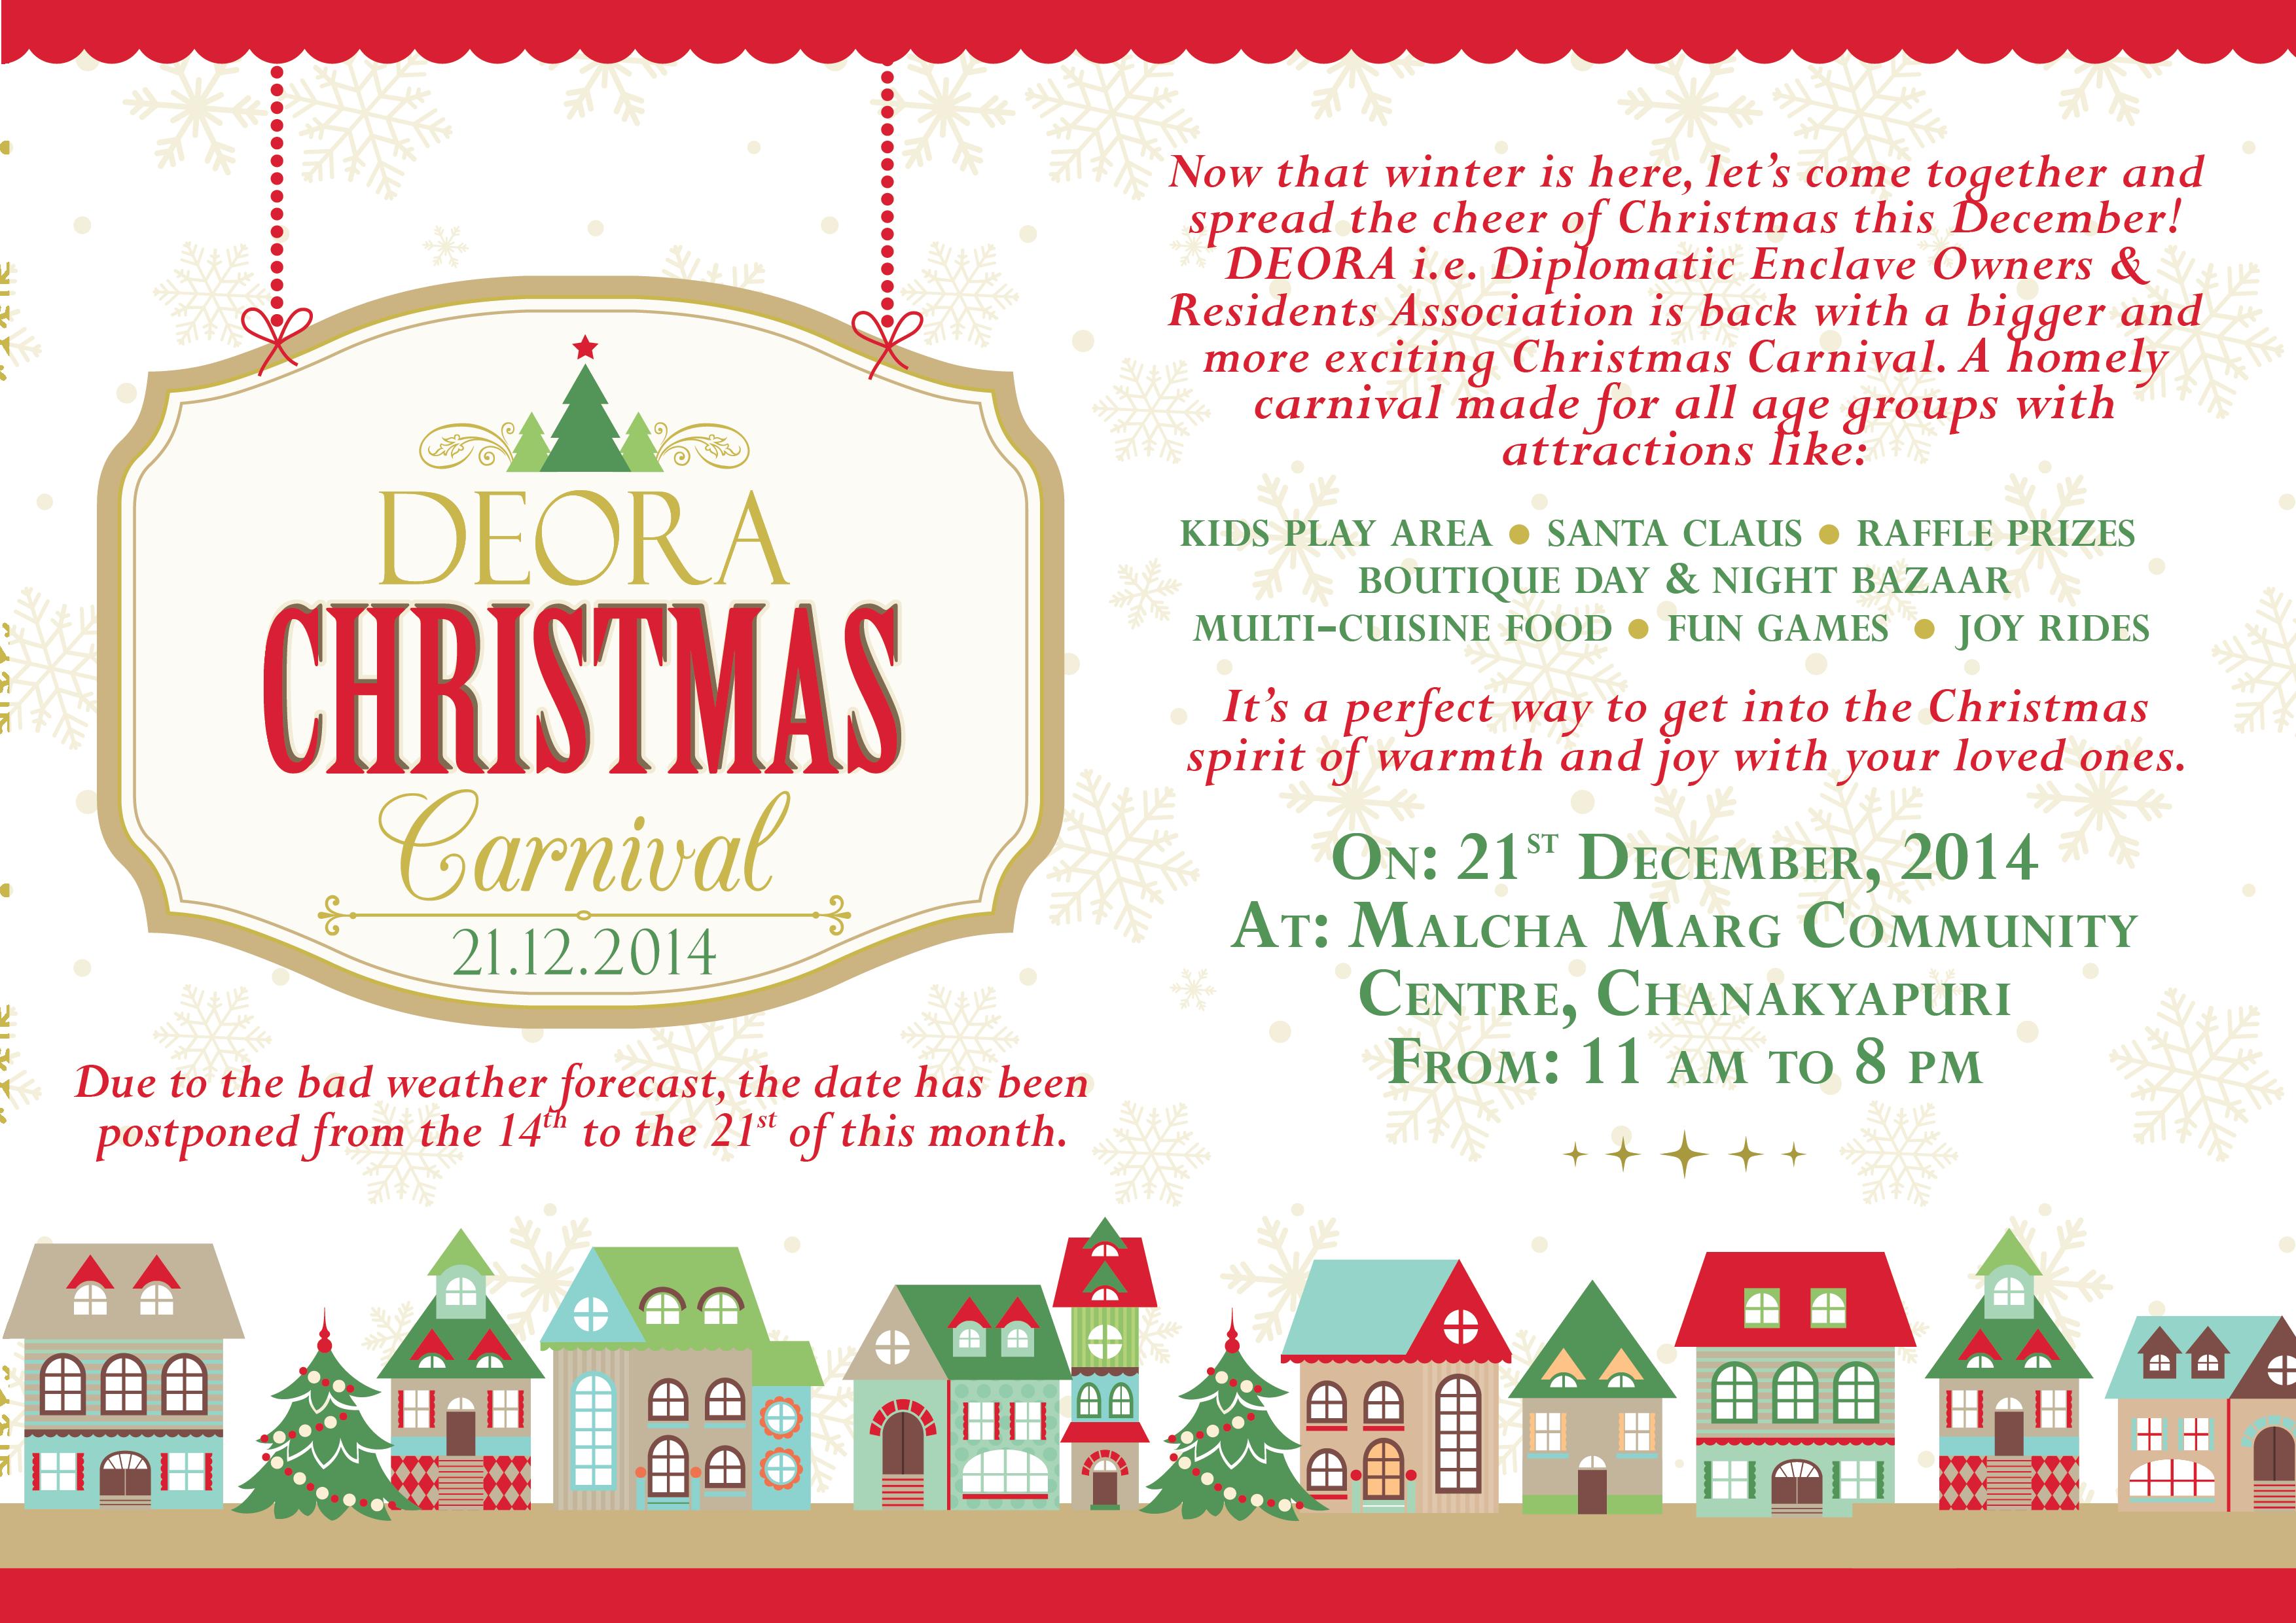 DEORA Christmas Carnival 2014